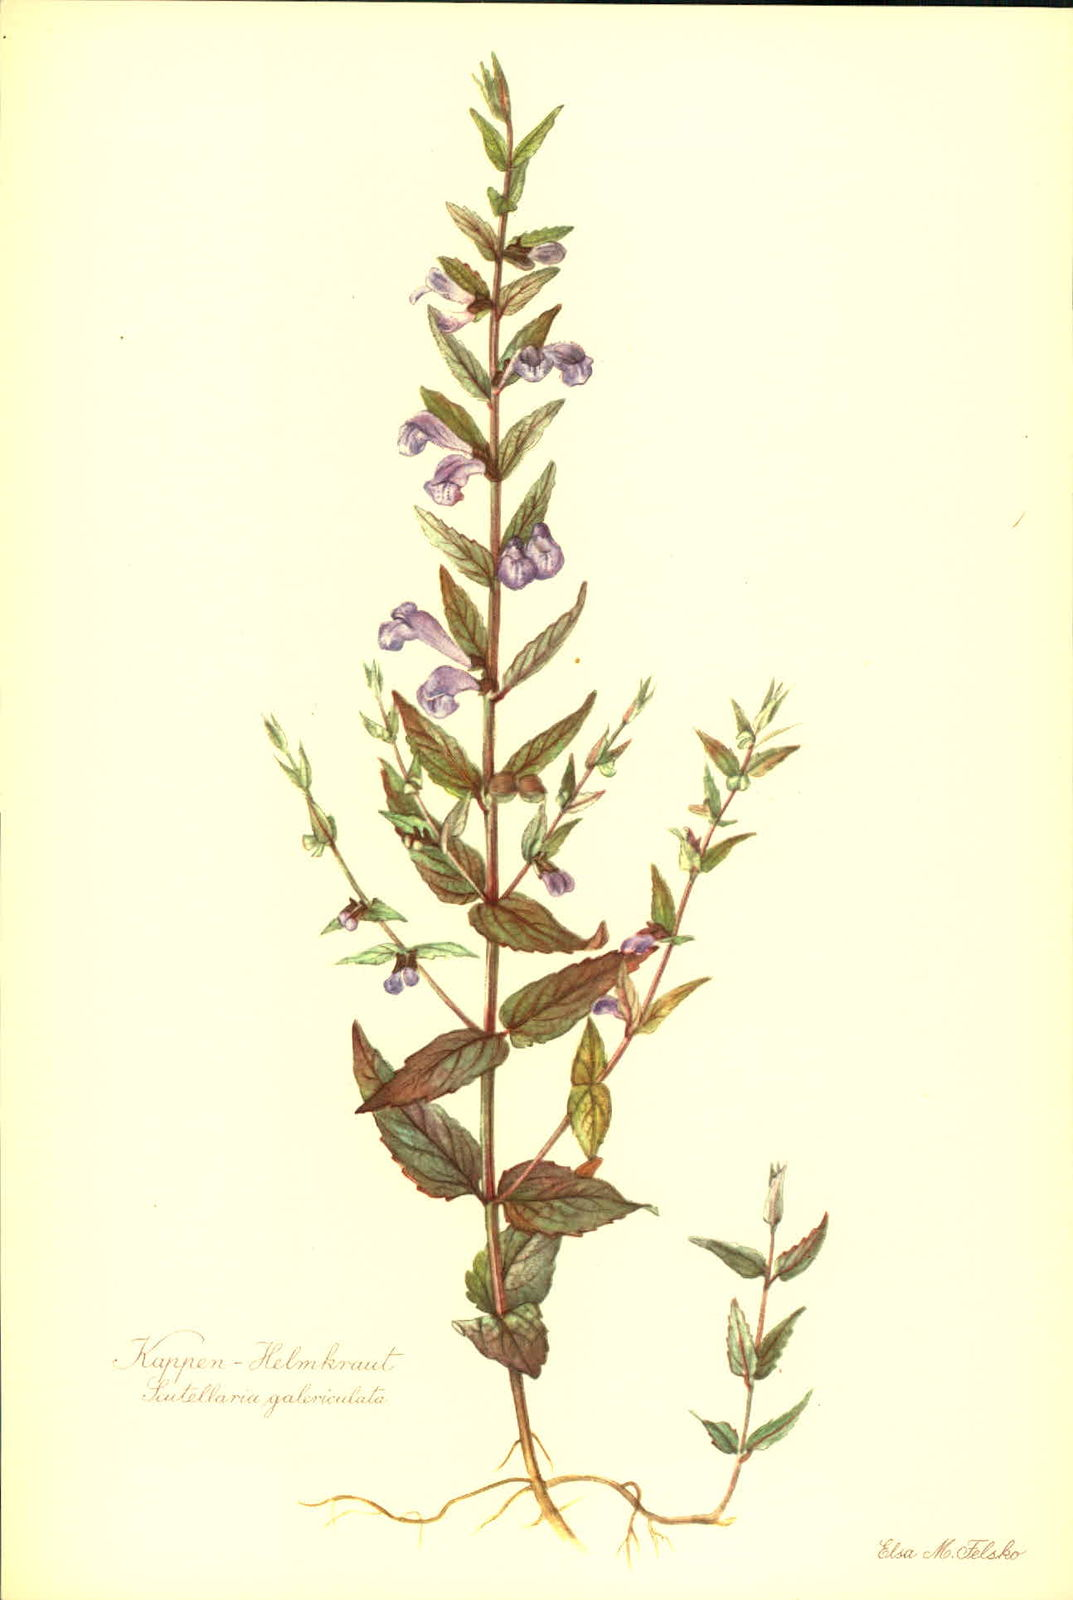 Kappen - Helmkraut (Scutellaria galericulata).